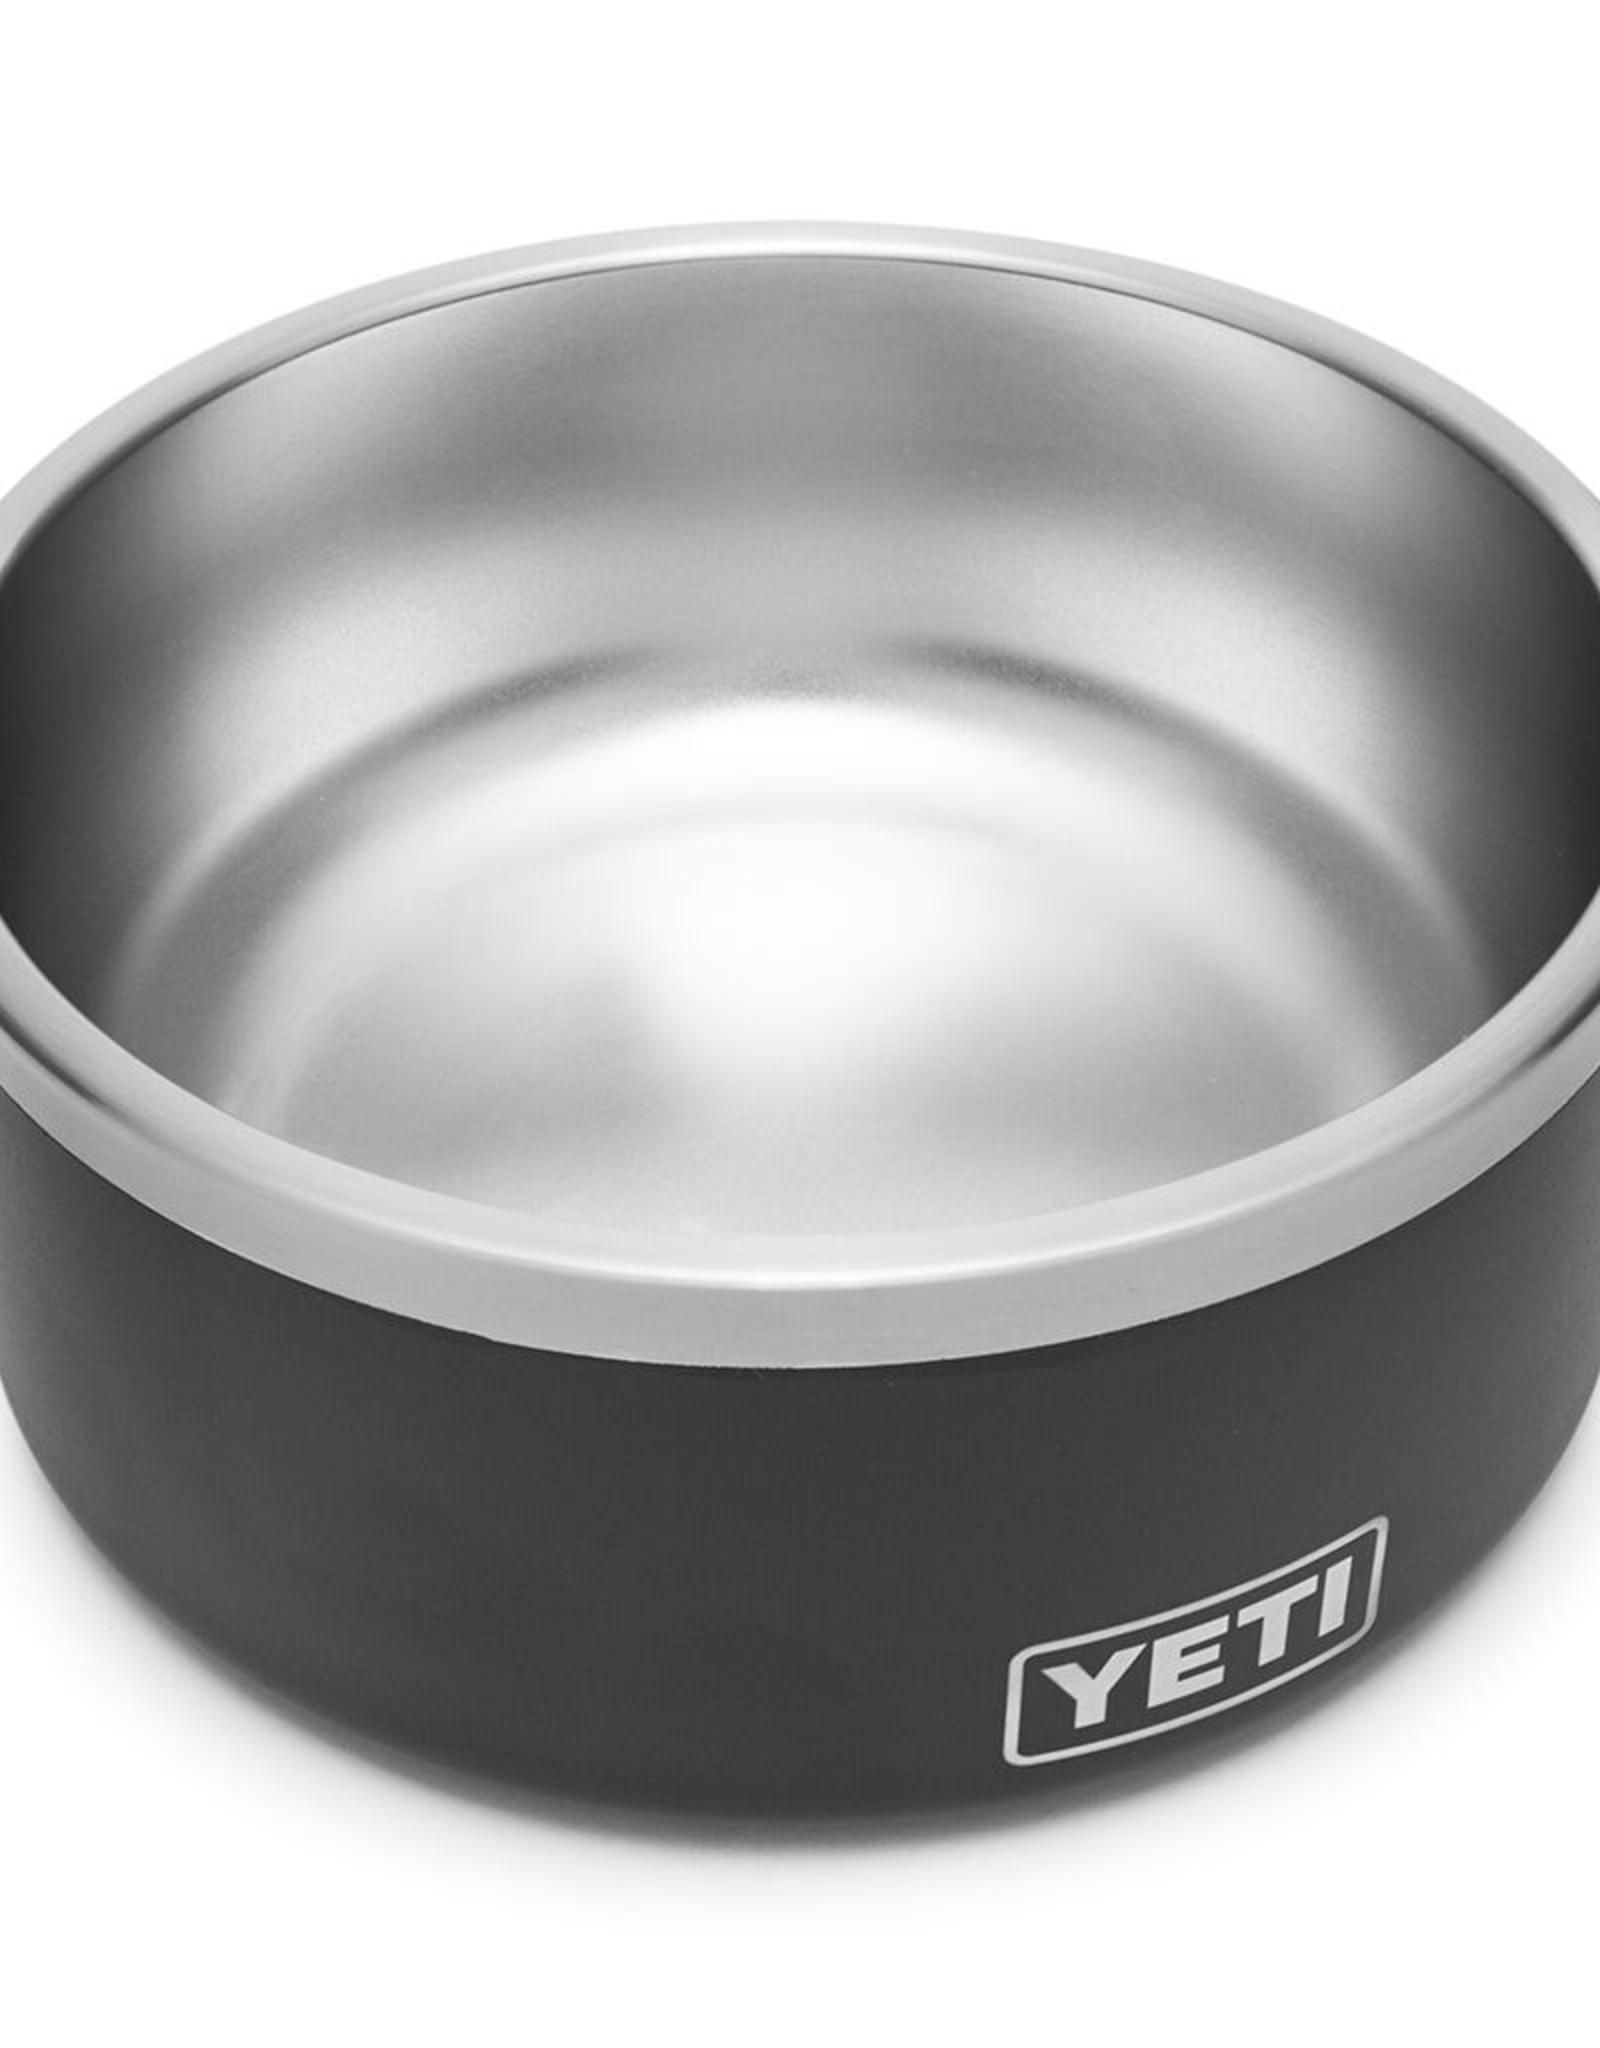 YETI Coolers Boomer 8 Dog Bowl - Black